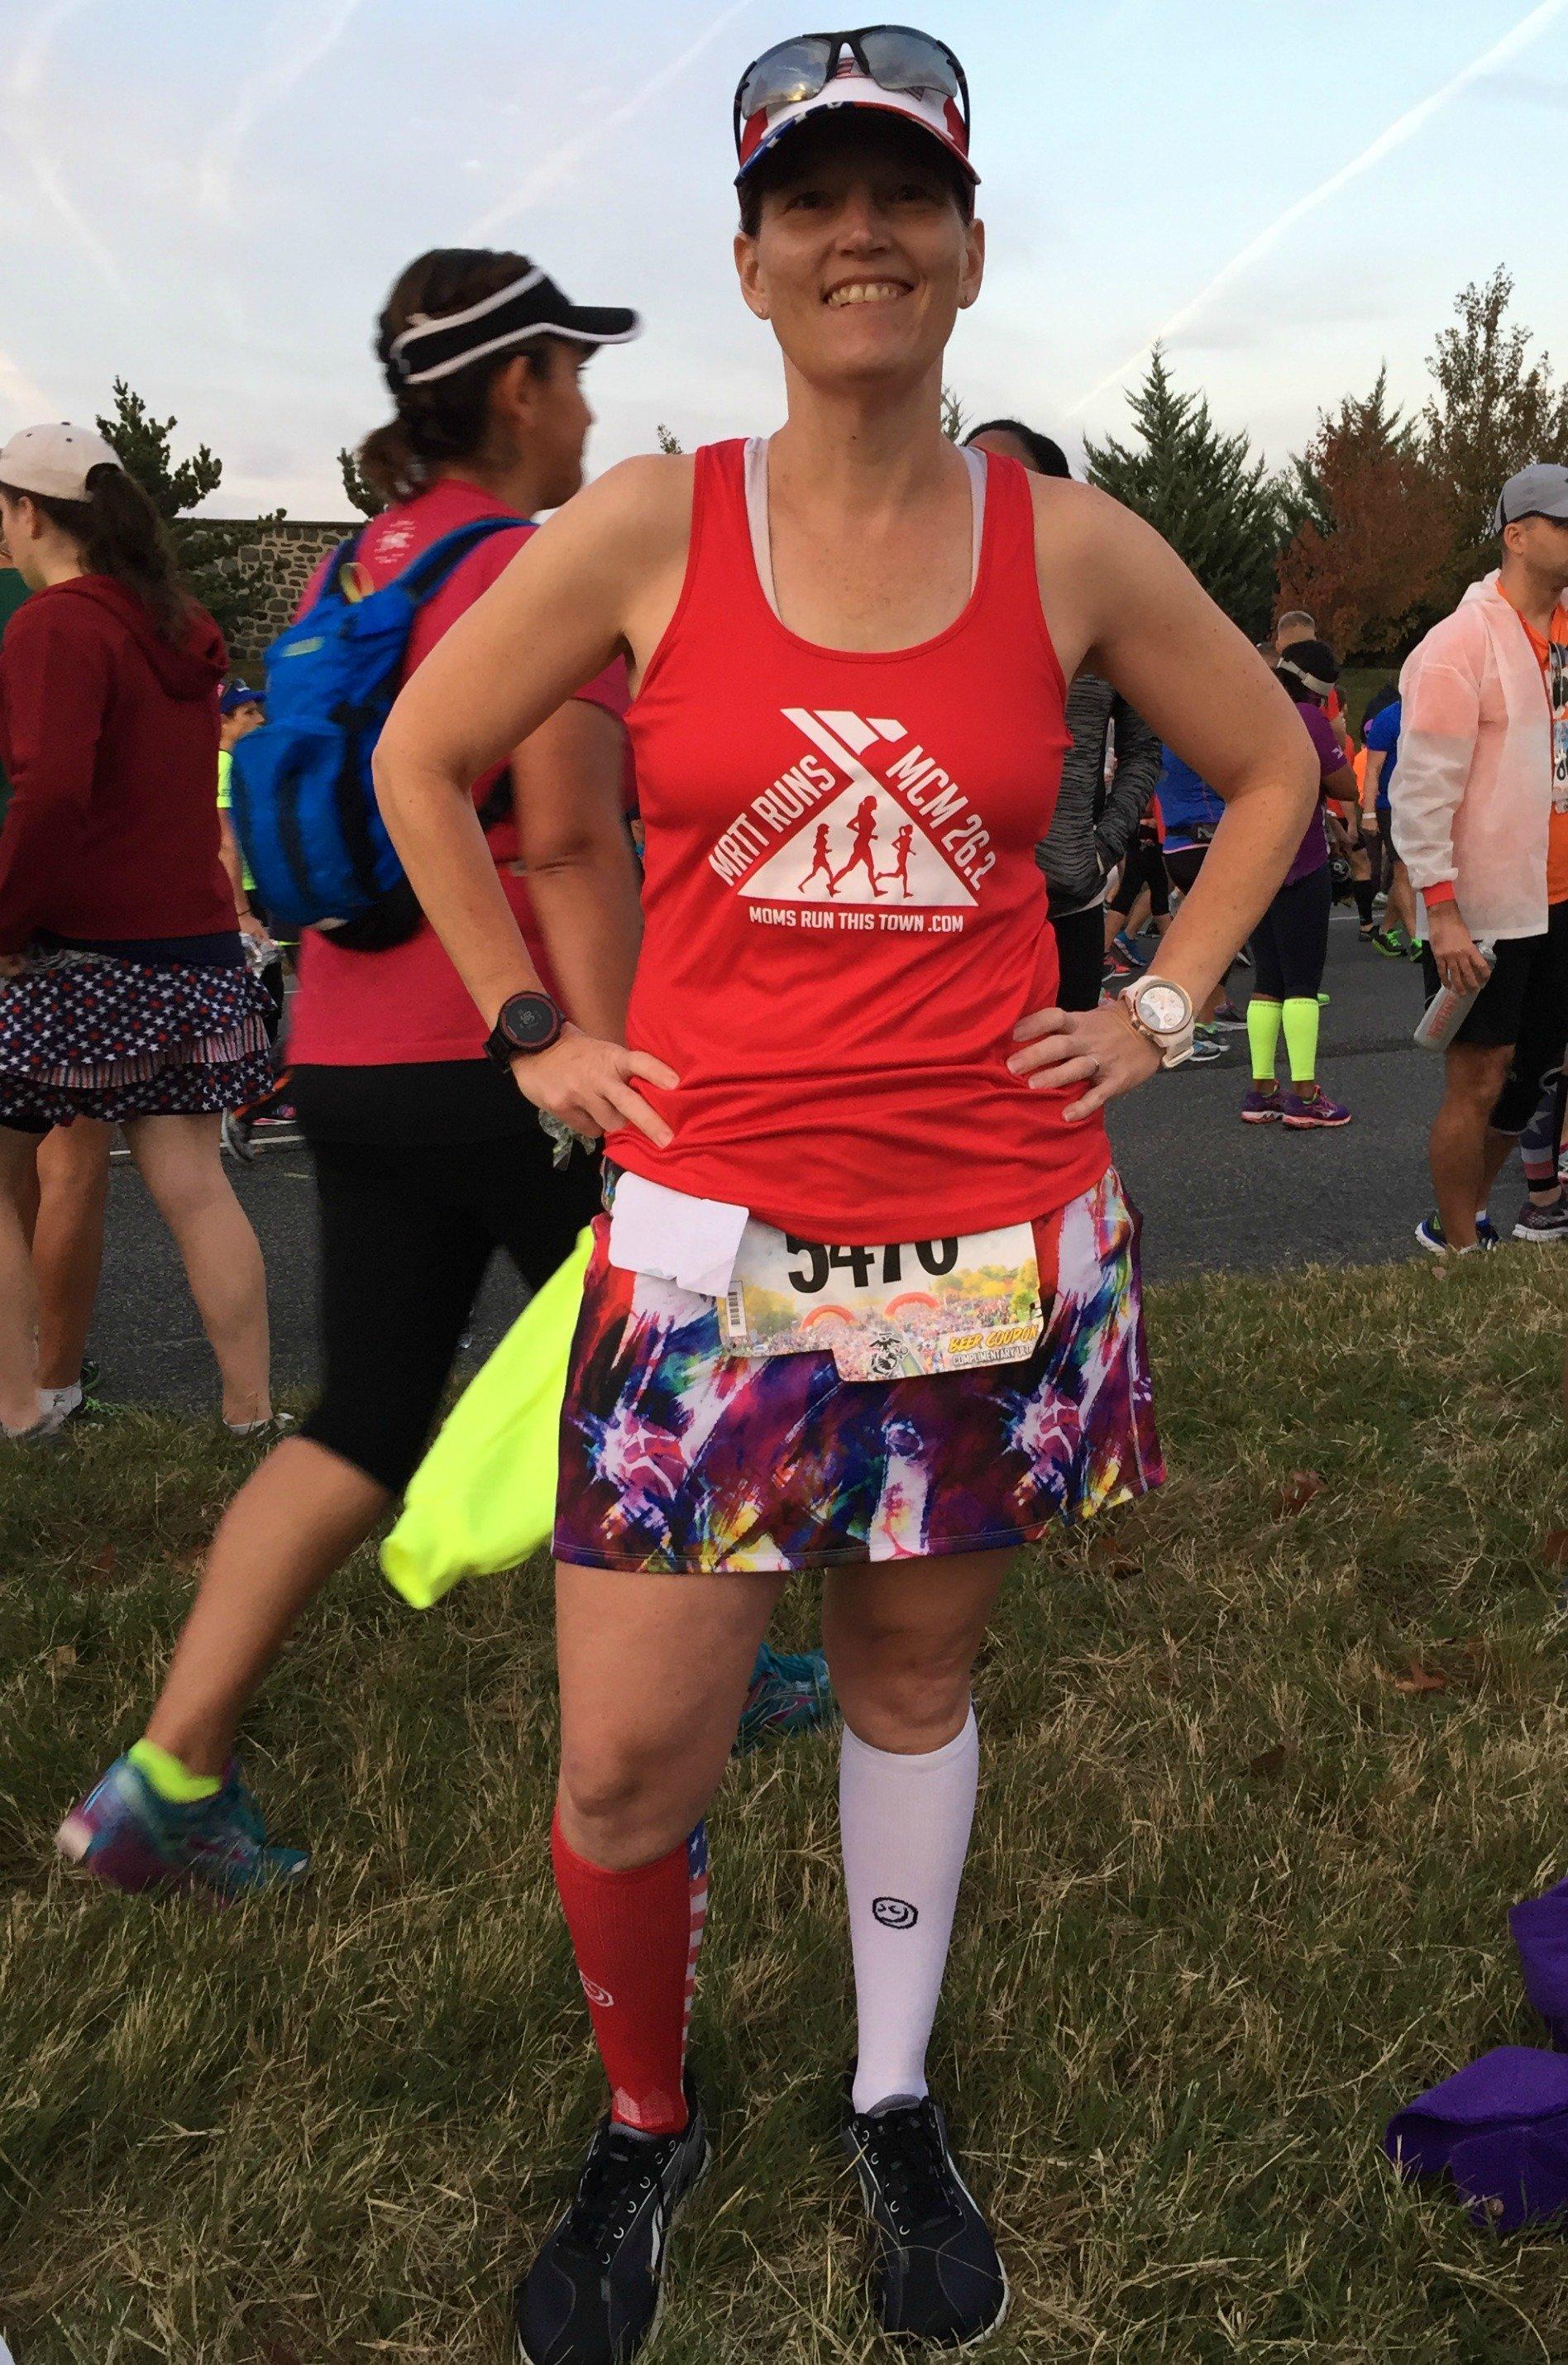 marine-corps-marathon-2016-start-outfit